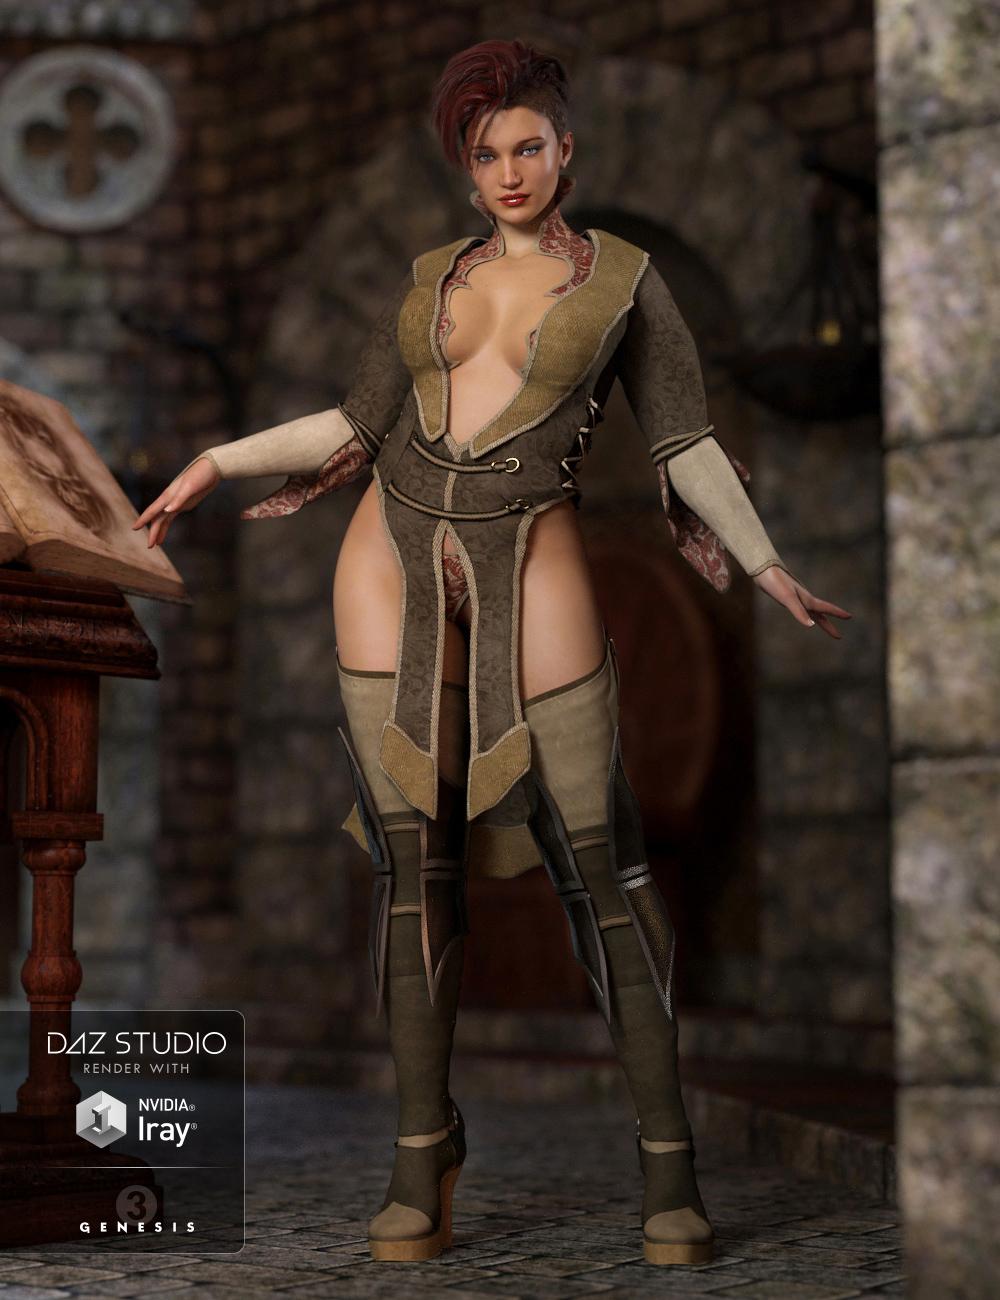 Zodiac Sorceress Outfit for Genesis 3 Female(s) by: Barbara BrundonSarsa, 3D Models by Daz 3D